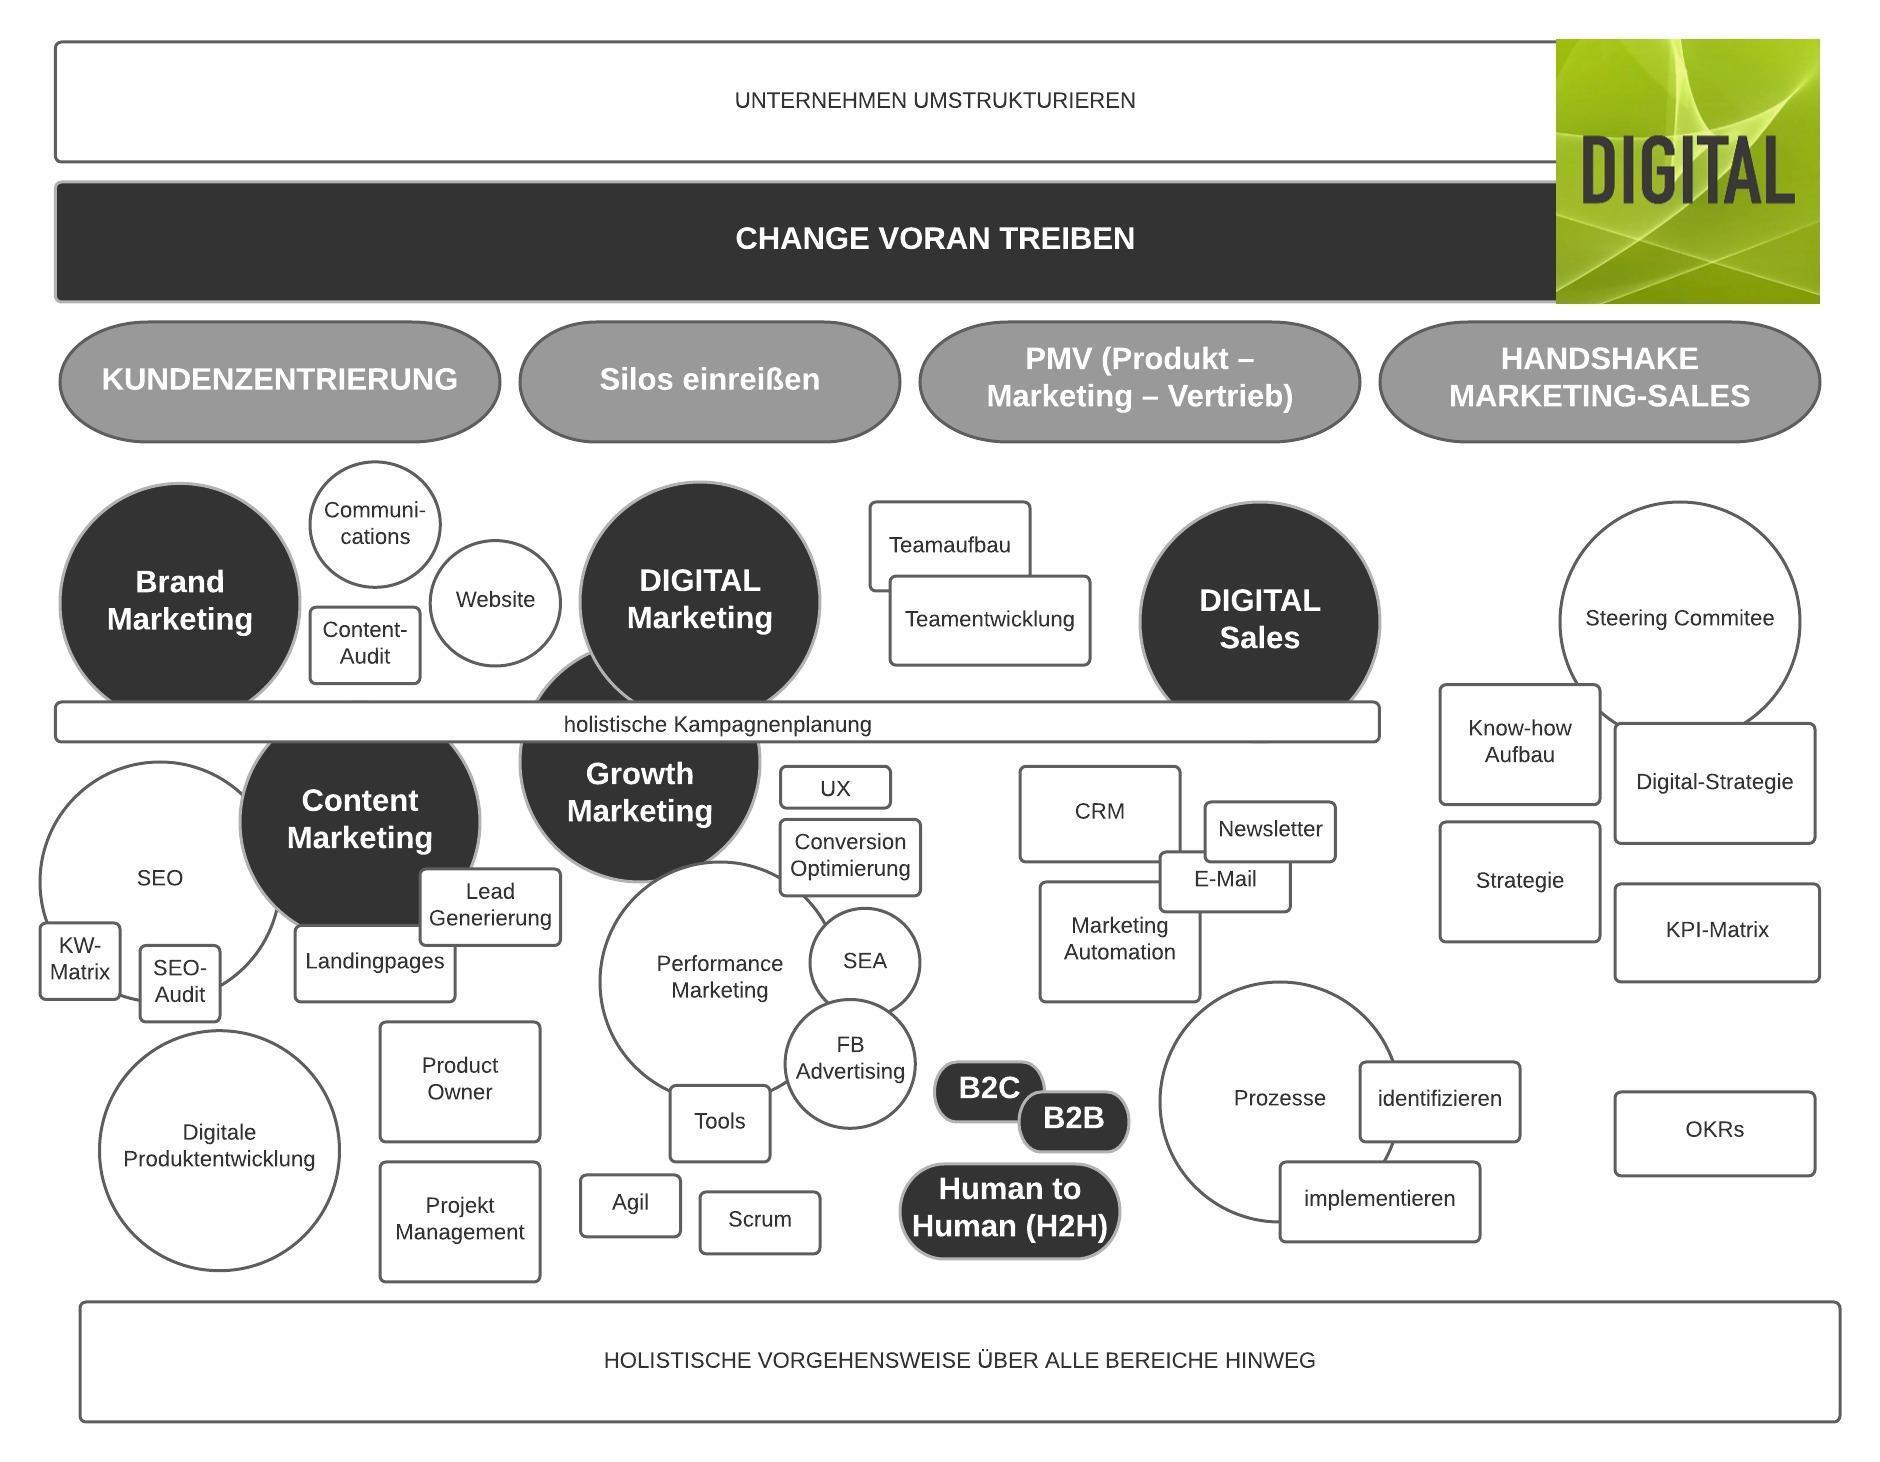 Maike Petersen | DIGITAL Marketing Expert - Übersicht der Aufgabenfelder